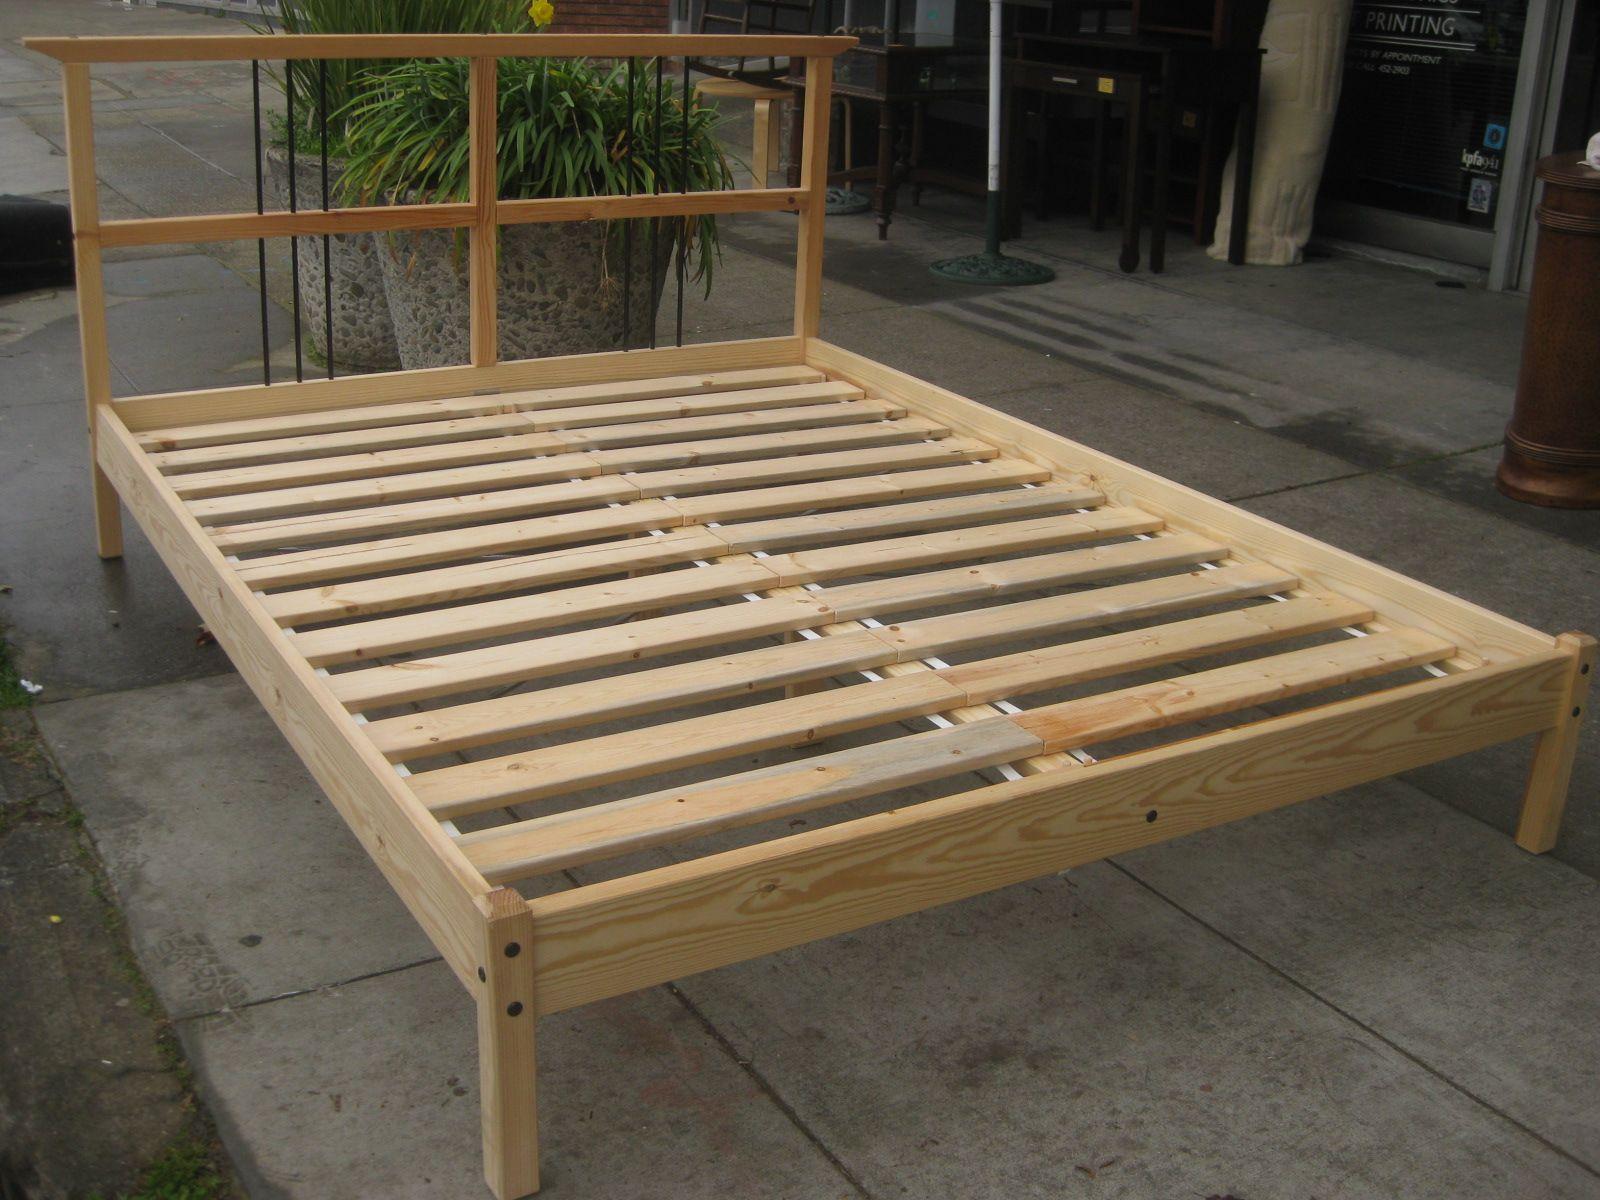 Box Springs vs Platform Beds The